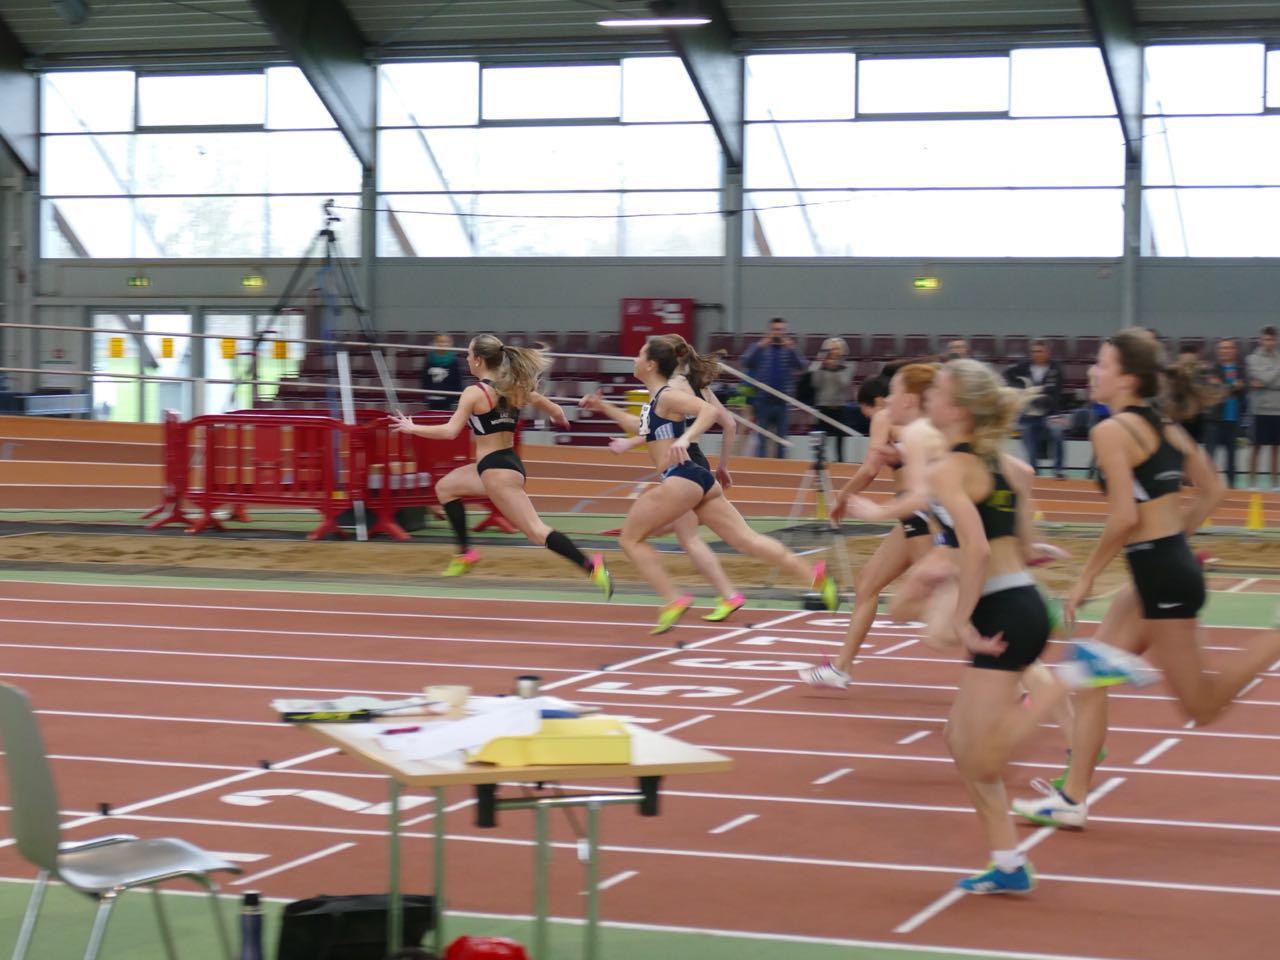 60m Finale WJU18: 1. Sophie Bleibtreu (Bahn 6), 4. Anna Clara Sturm (Bahn 5)